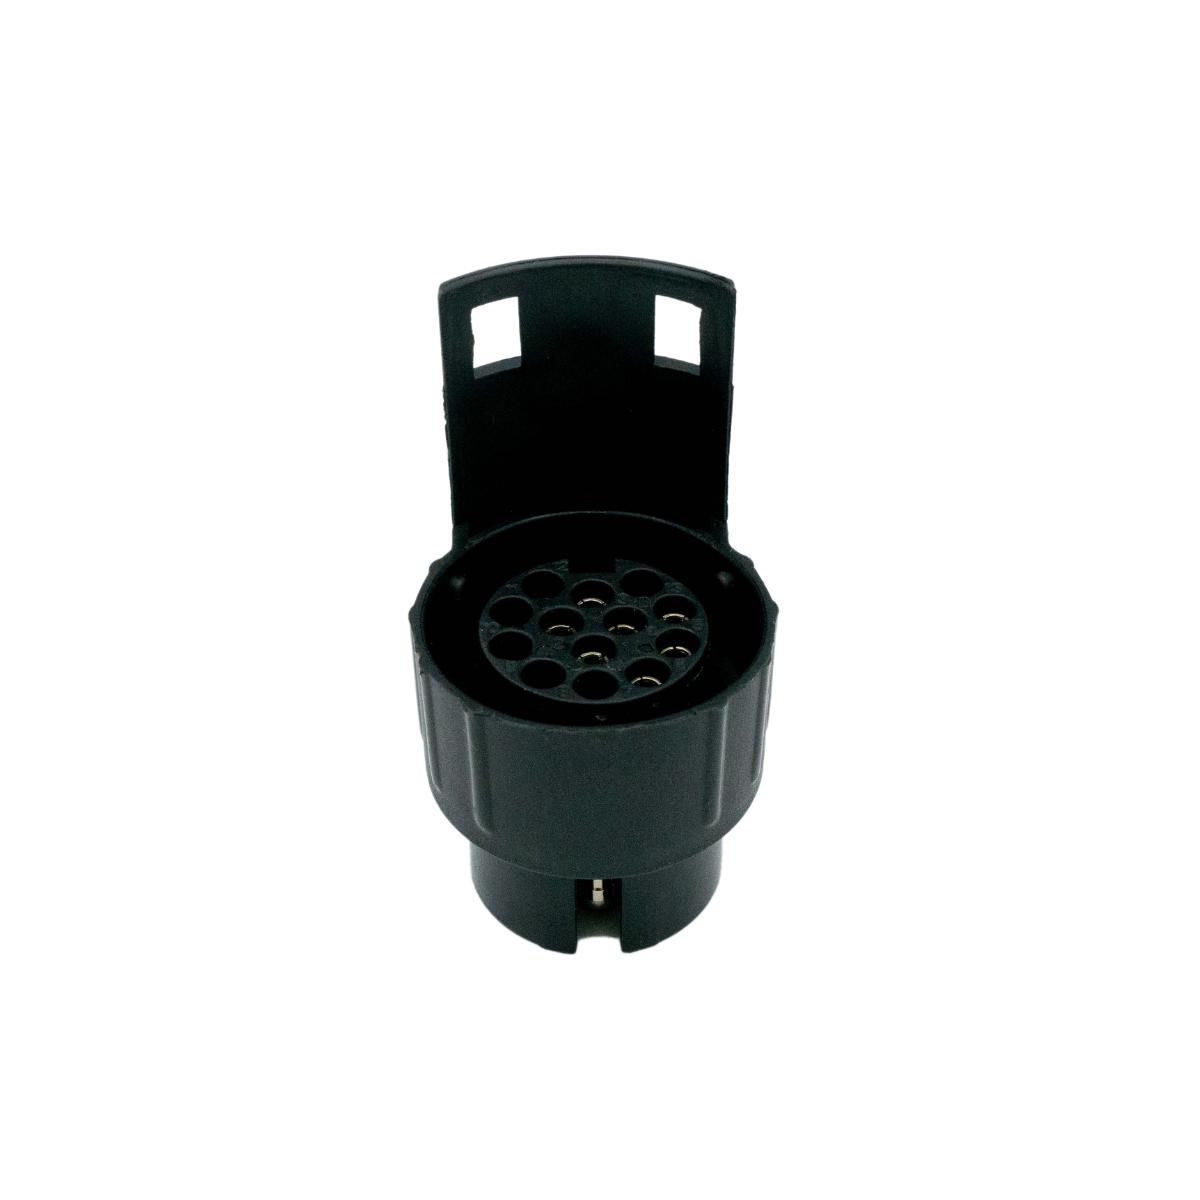 D&W Anhänger Mini-Adapter Steckdose 7-polig auf Stecker 13-polig – 12V